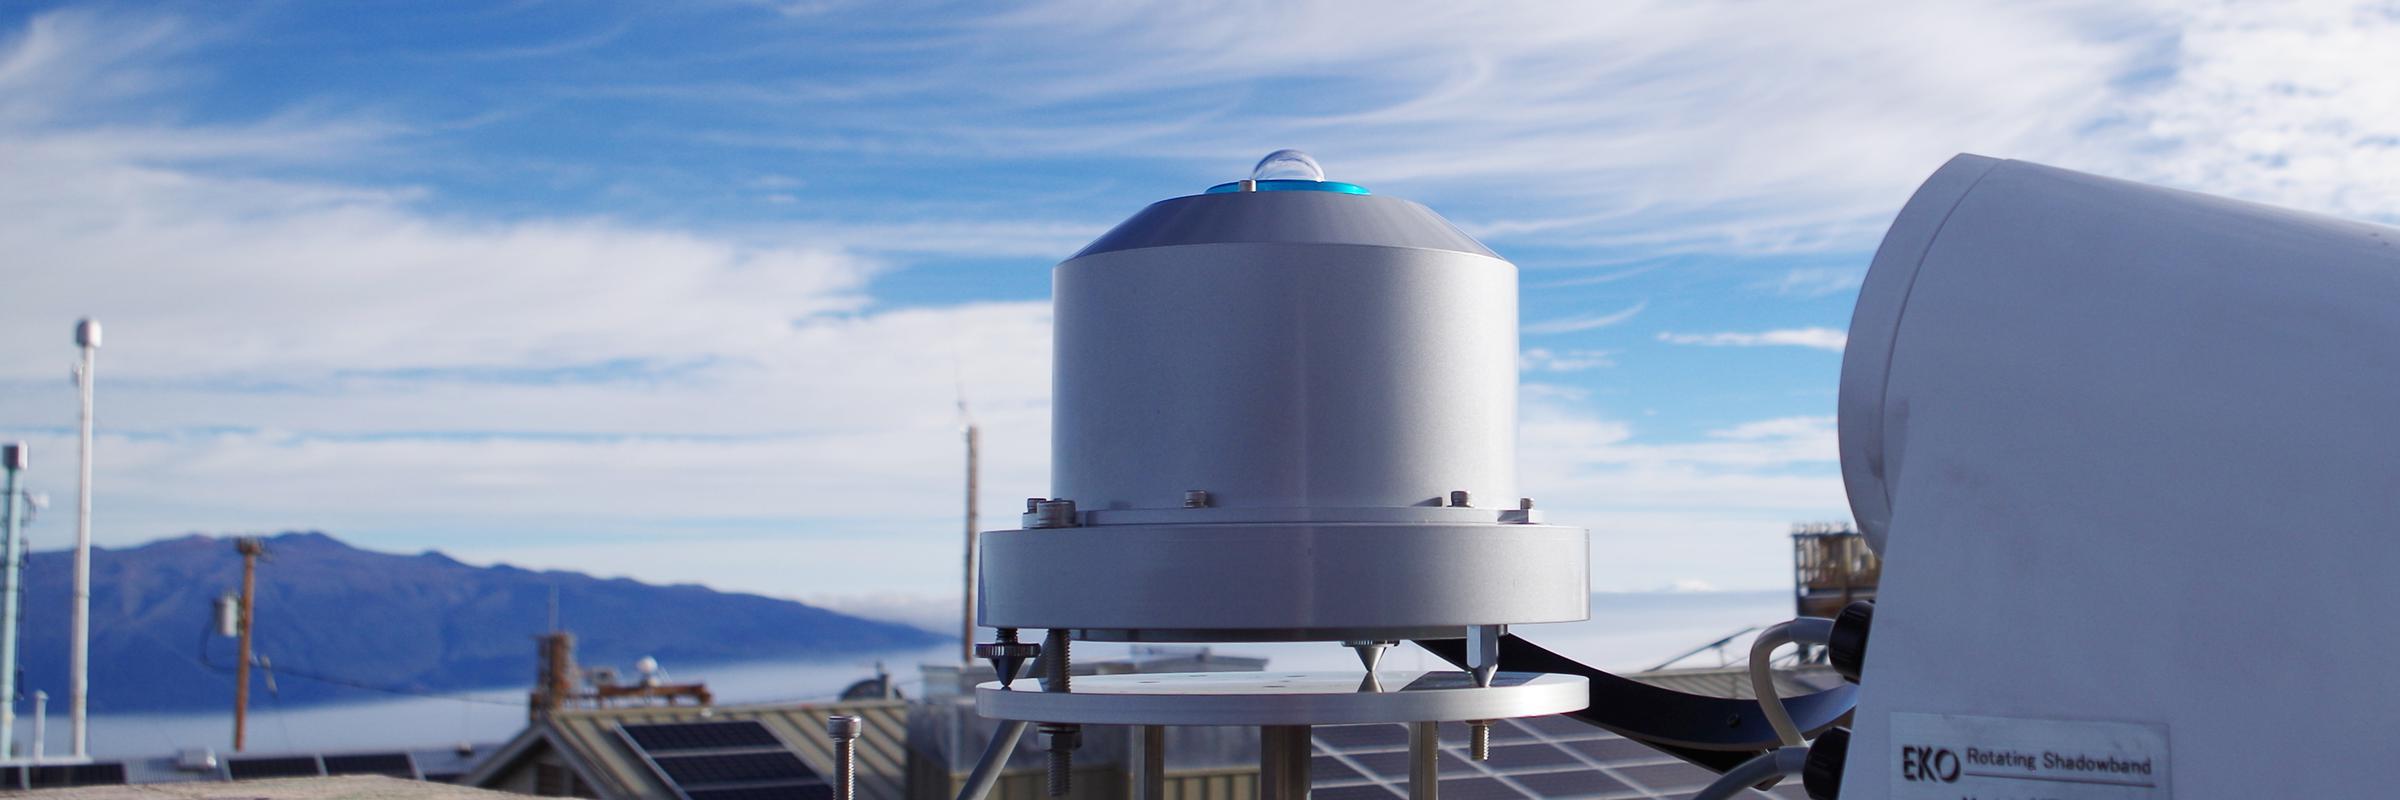 Solar Spectral Irradiance Measurements